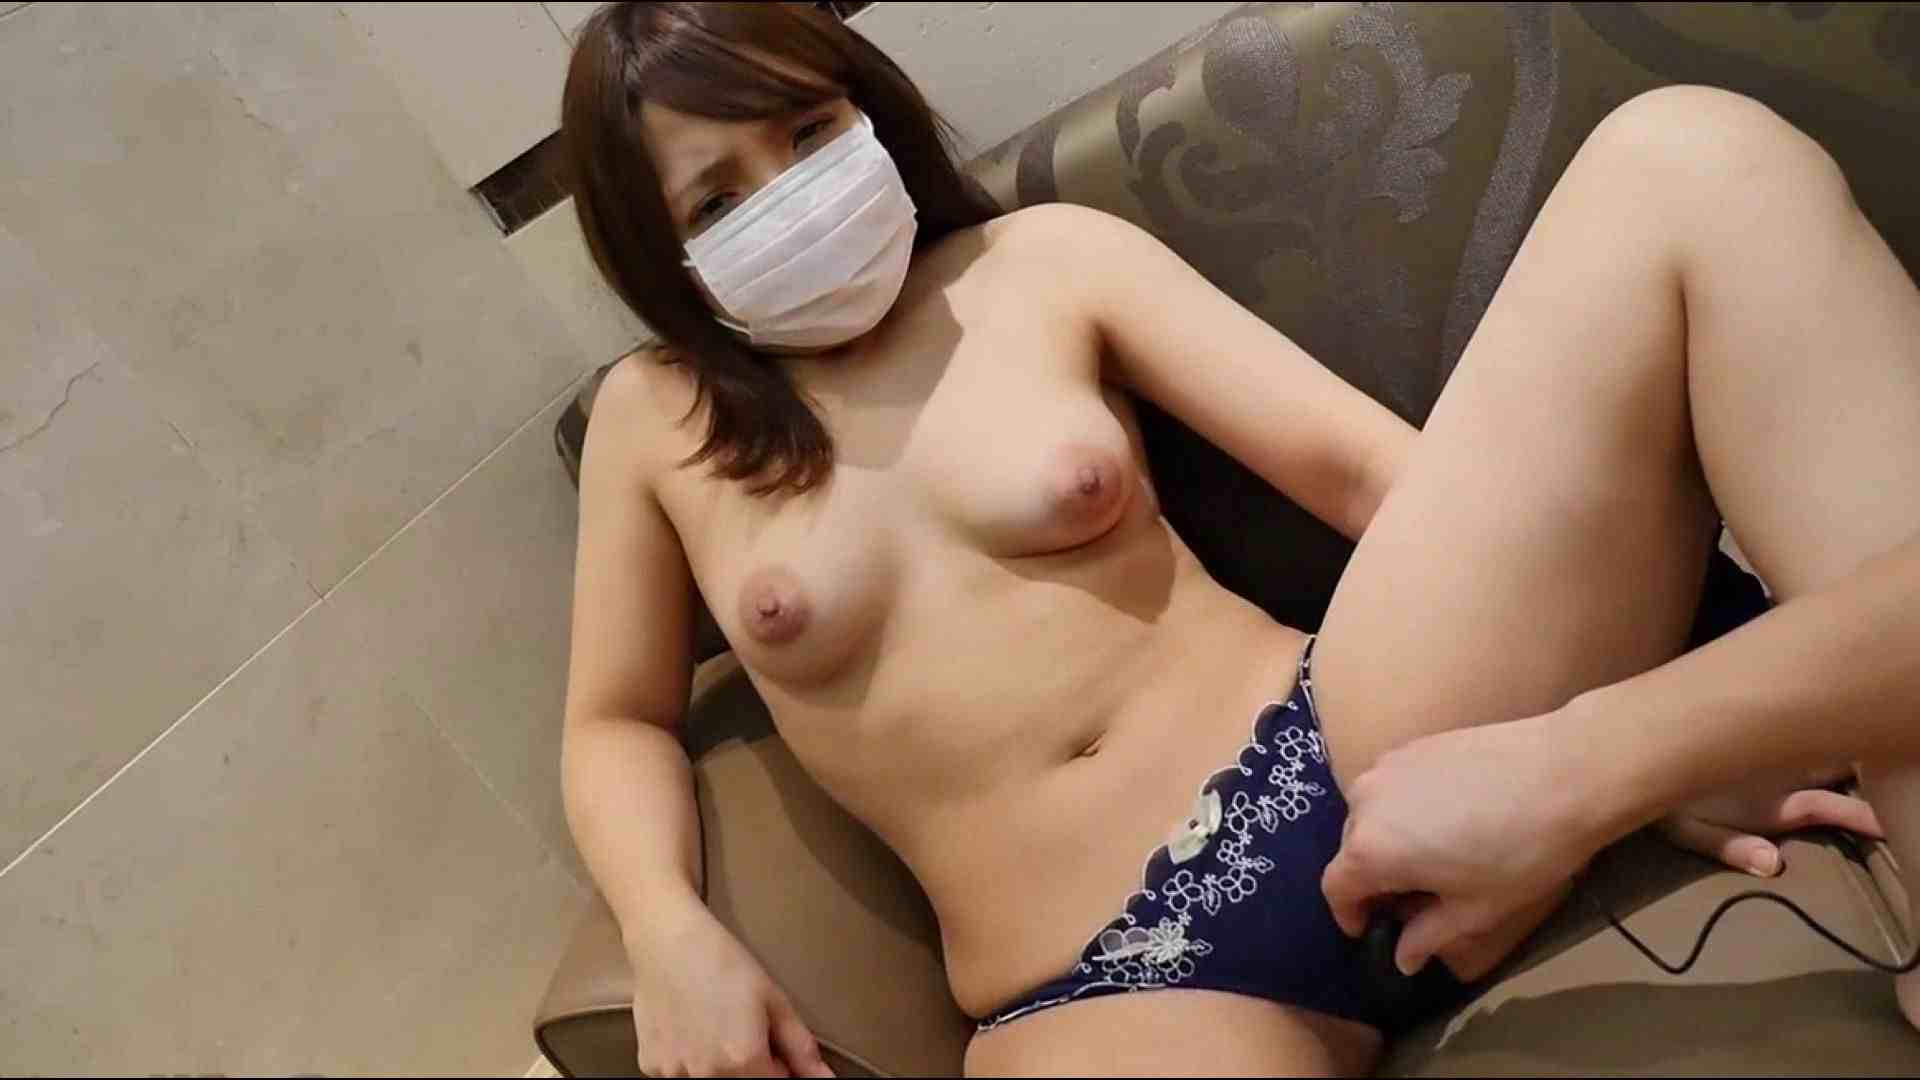 S級厳選美女ビッチガールVol.41 前編 美女  83pic 64